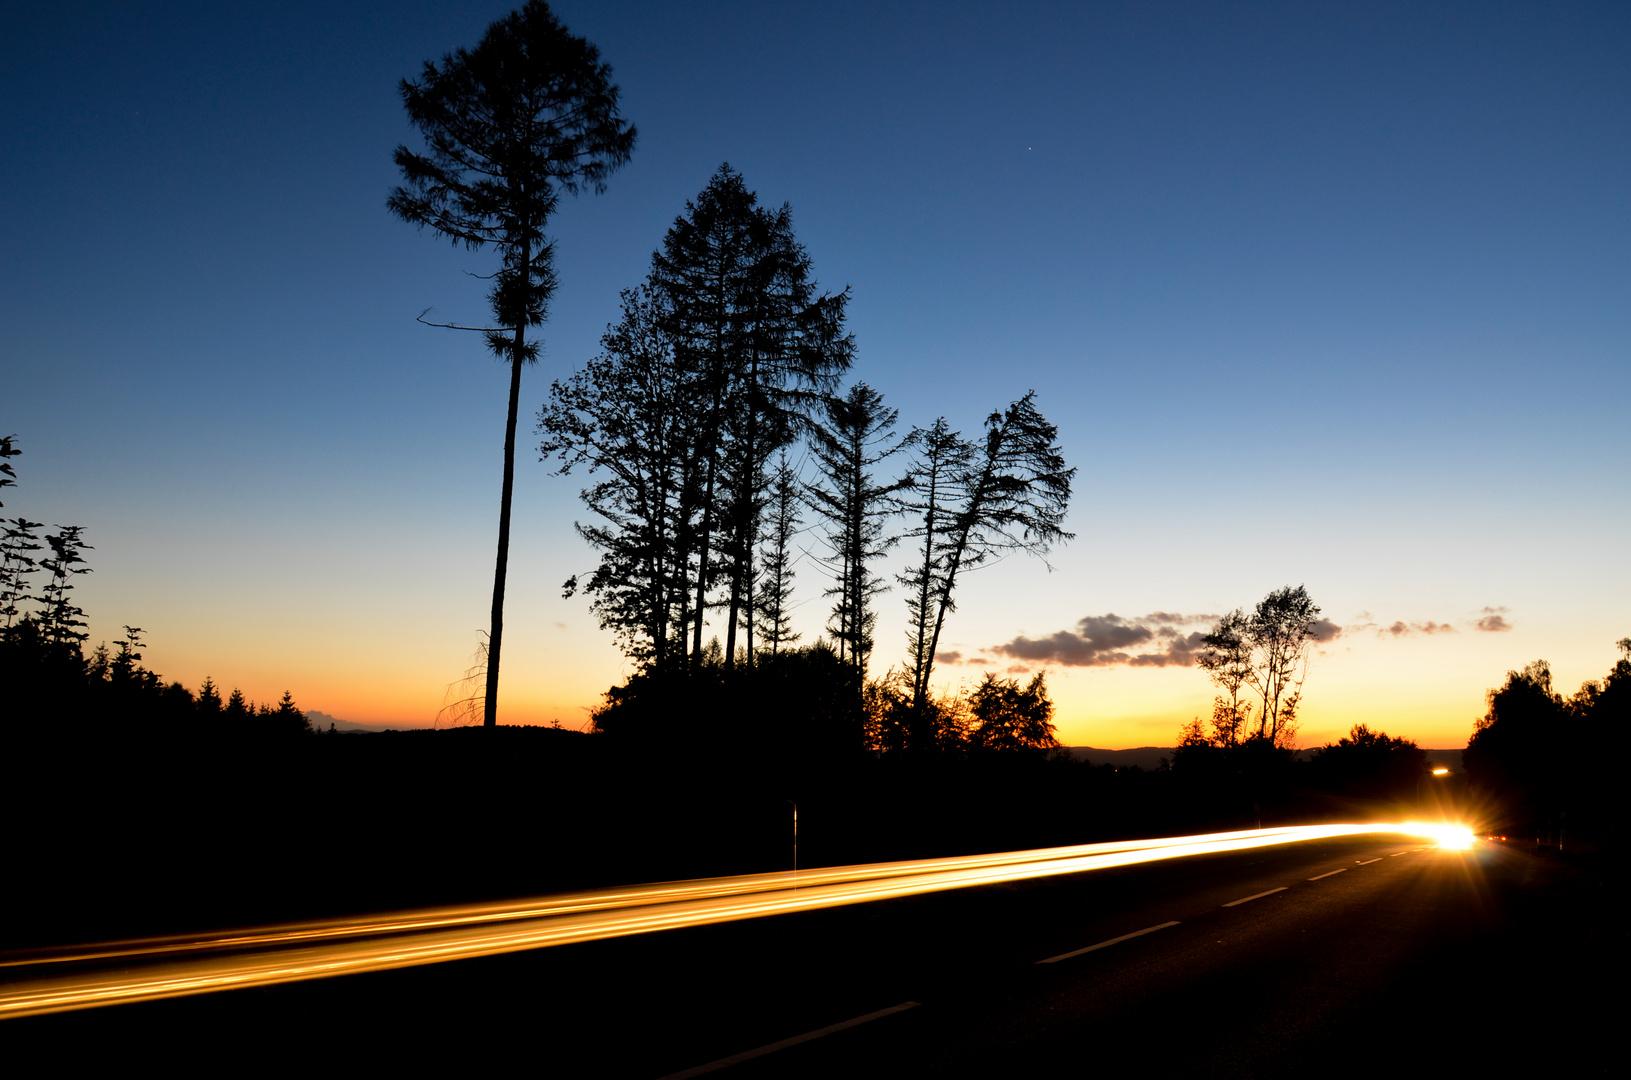 Sonnenuntergang in Schwerte